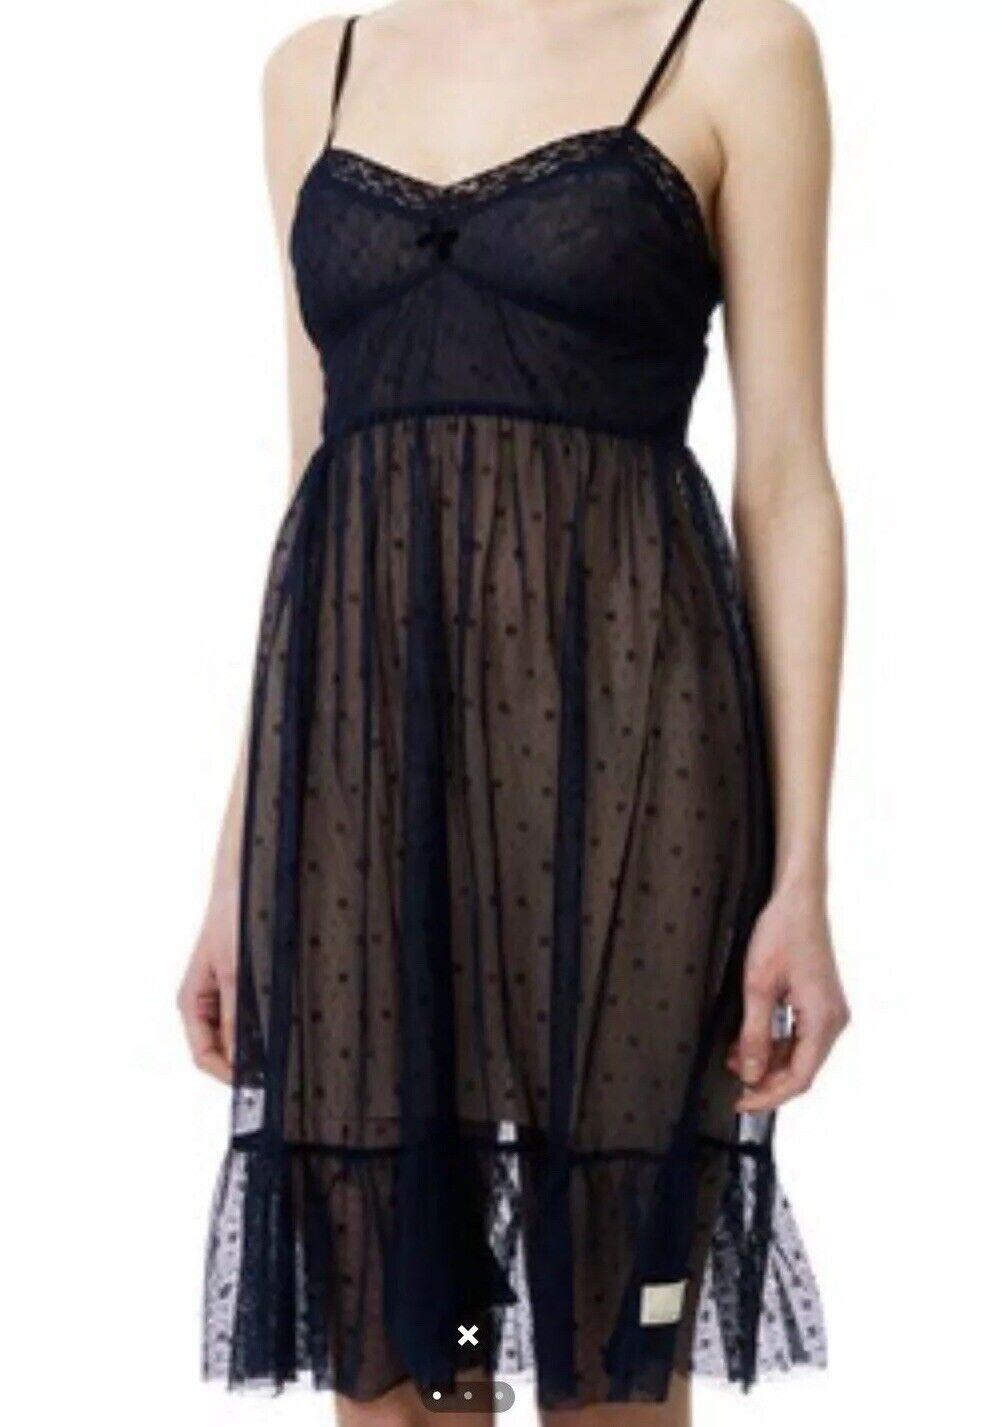 Odd Molly Lacy Strap Dress Boho Blogger Party 1   2 S 36 38